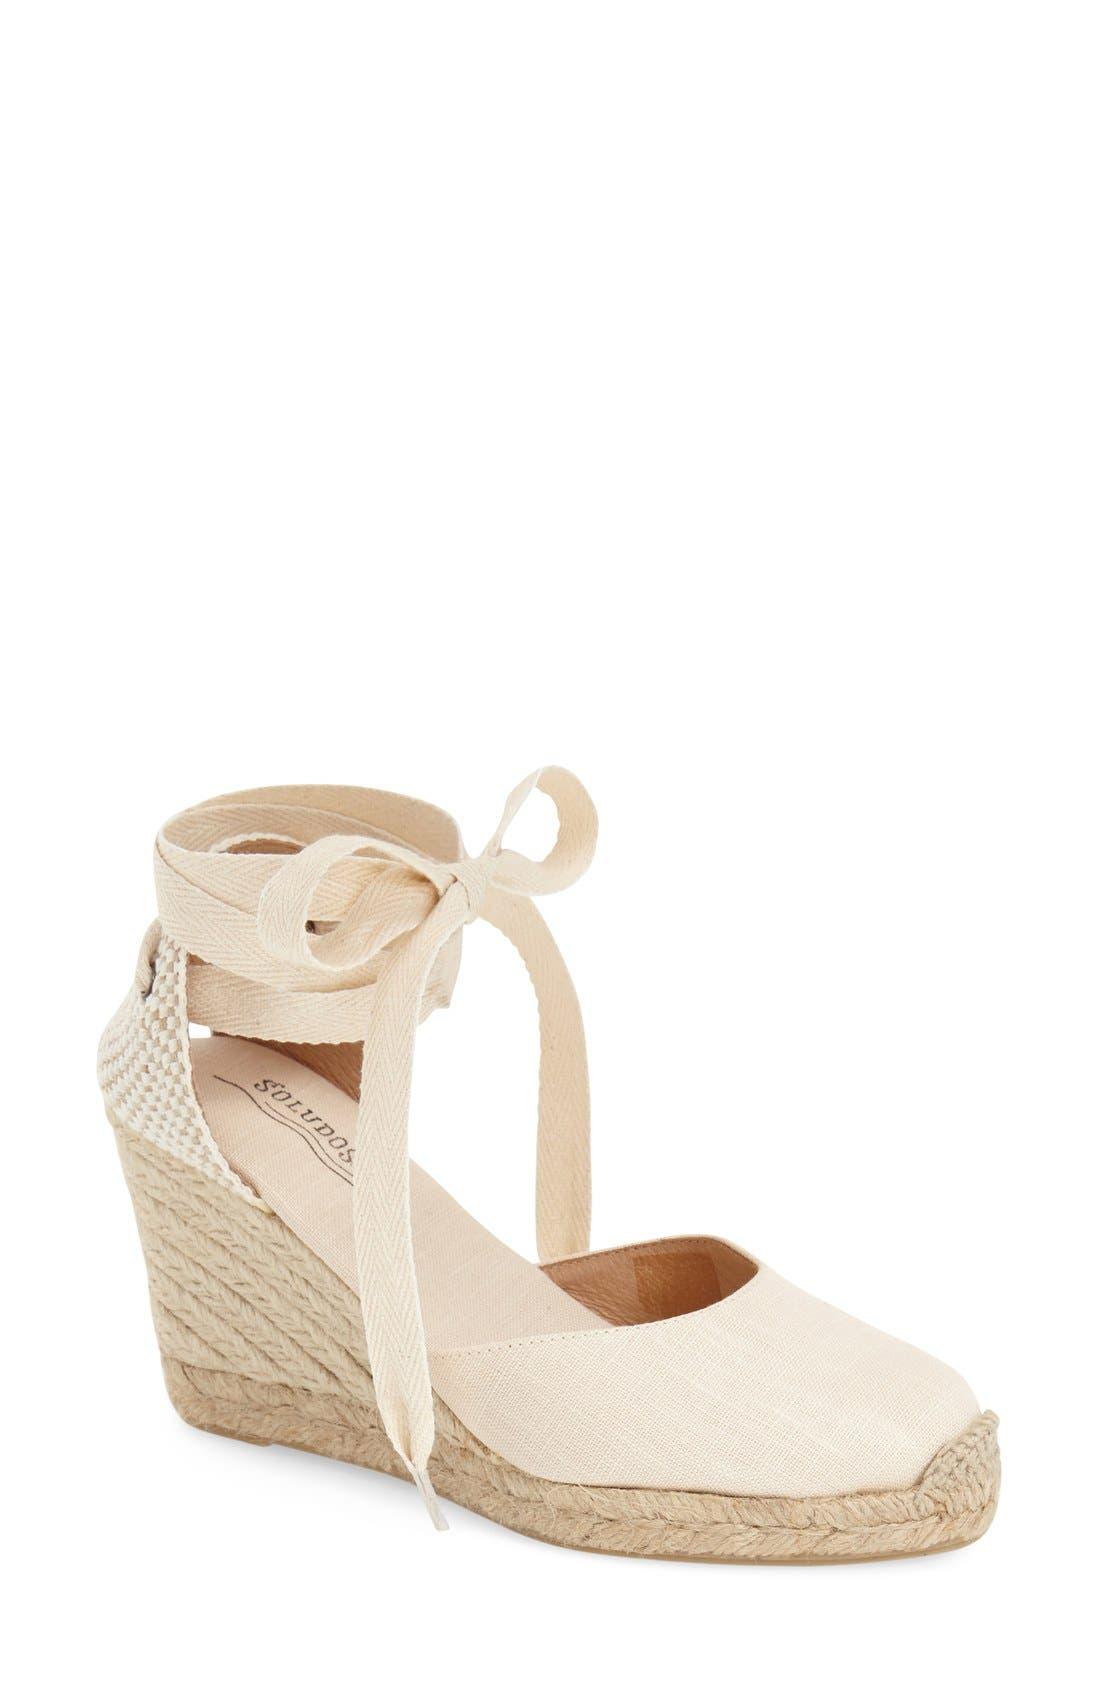 SOLUDOS Wedge Lace-Up Espadrille Sandal, Main, color, BLUSH LINEN